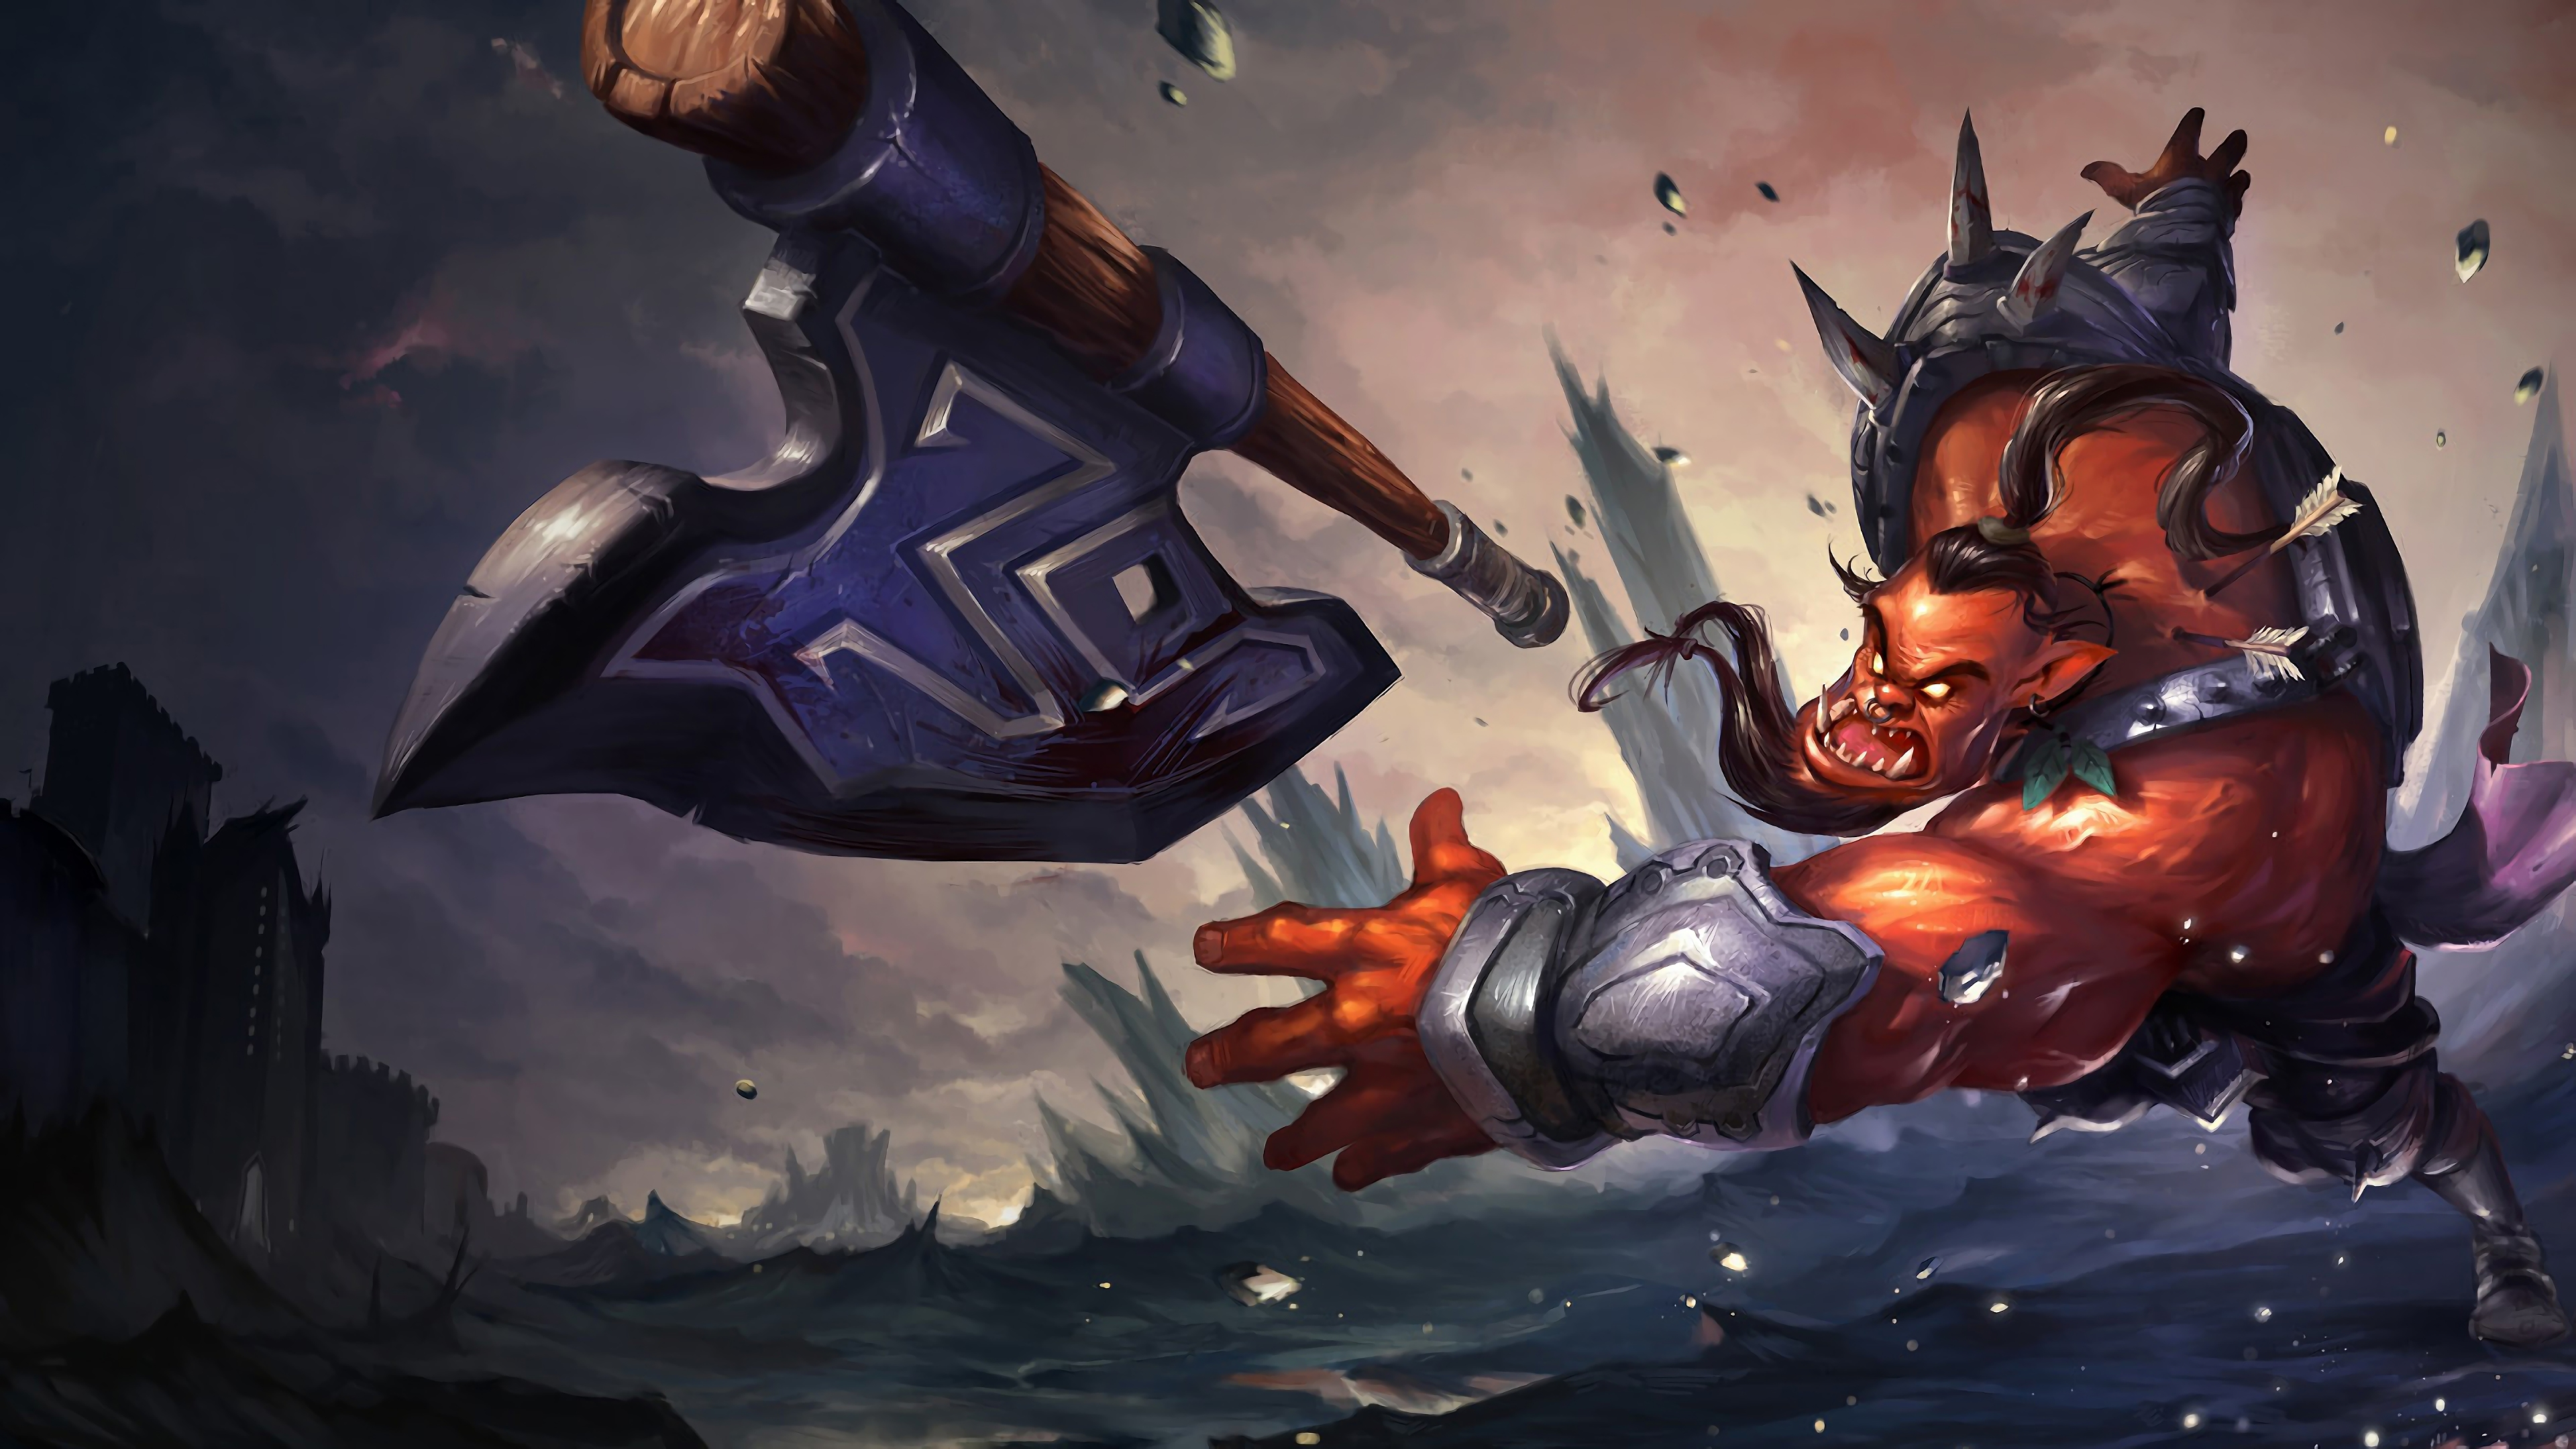 rageborn mundo lol splash art league of legends 1574098596 - Rageborn Mundo LoL Splash Art League of Legends - league of legends